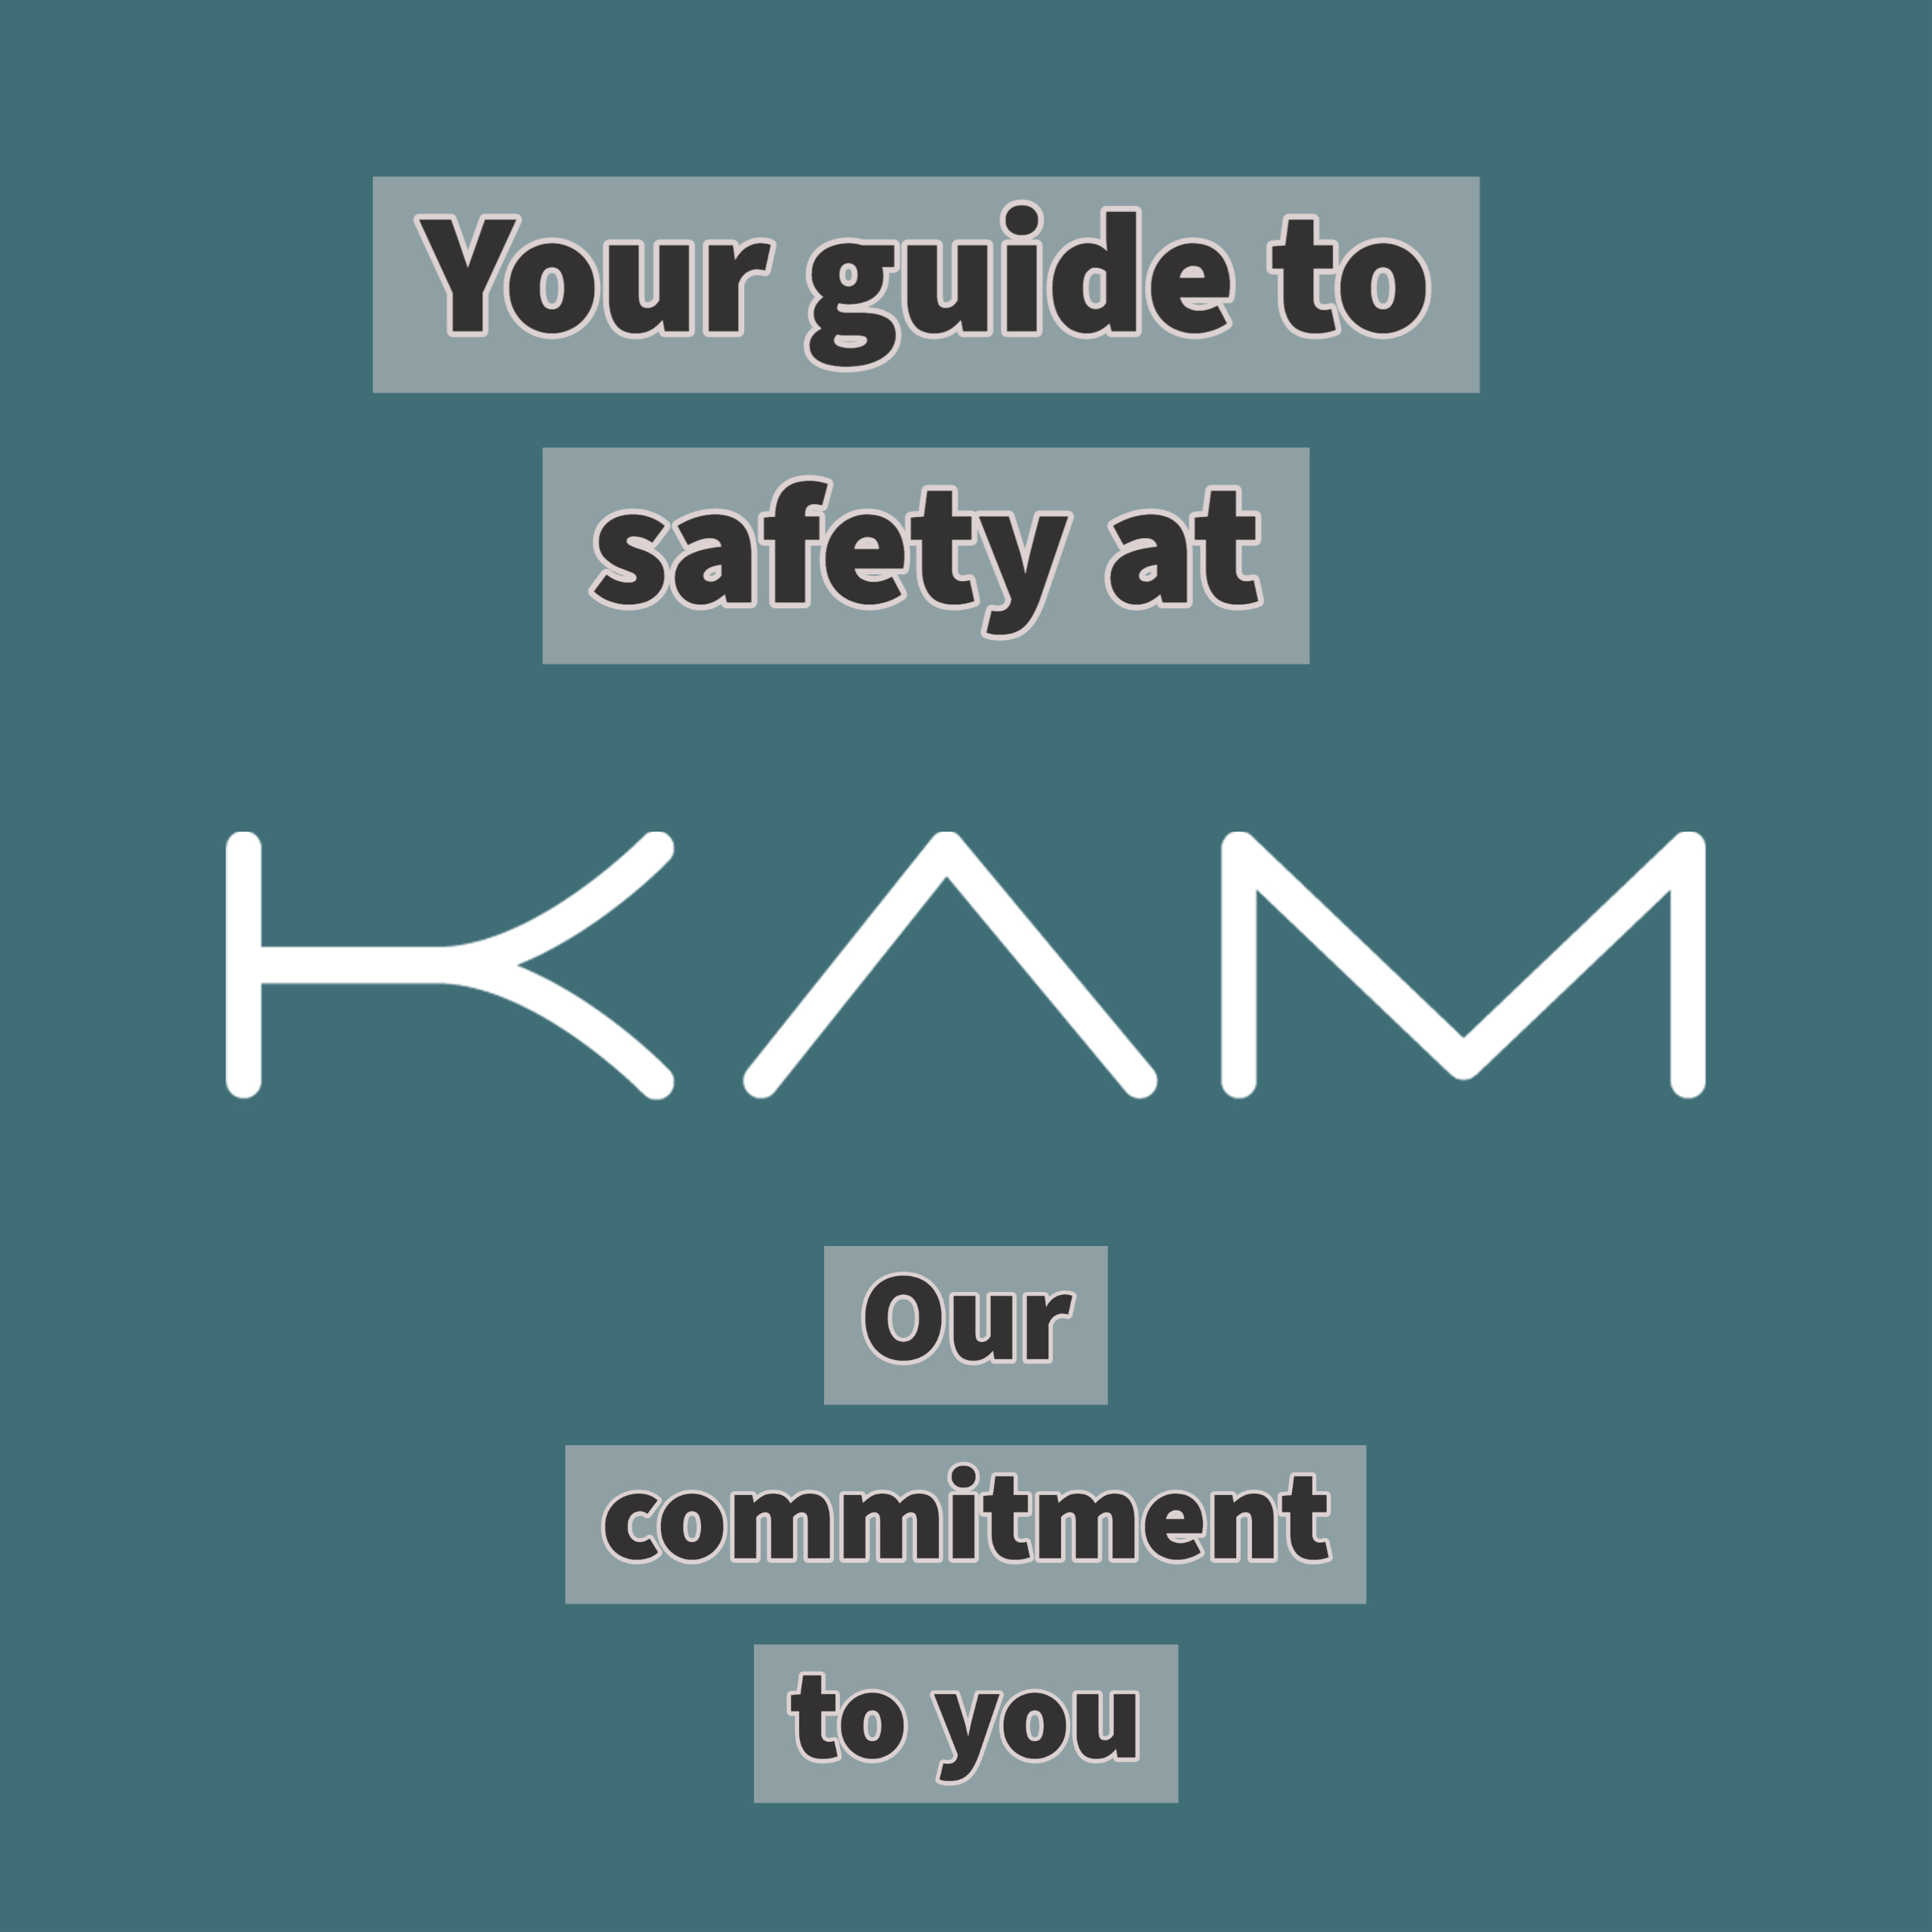 kam safety - www.salonbusiness.co.uk